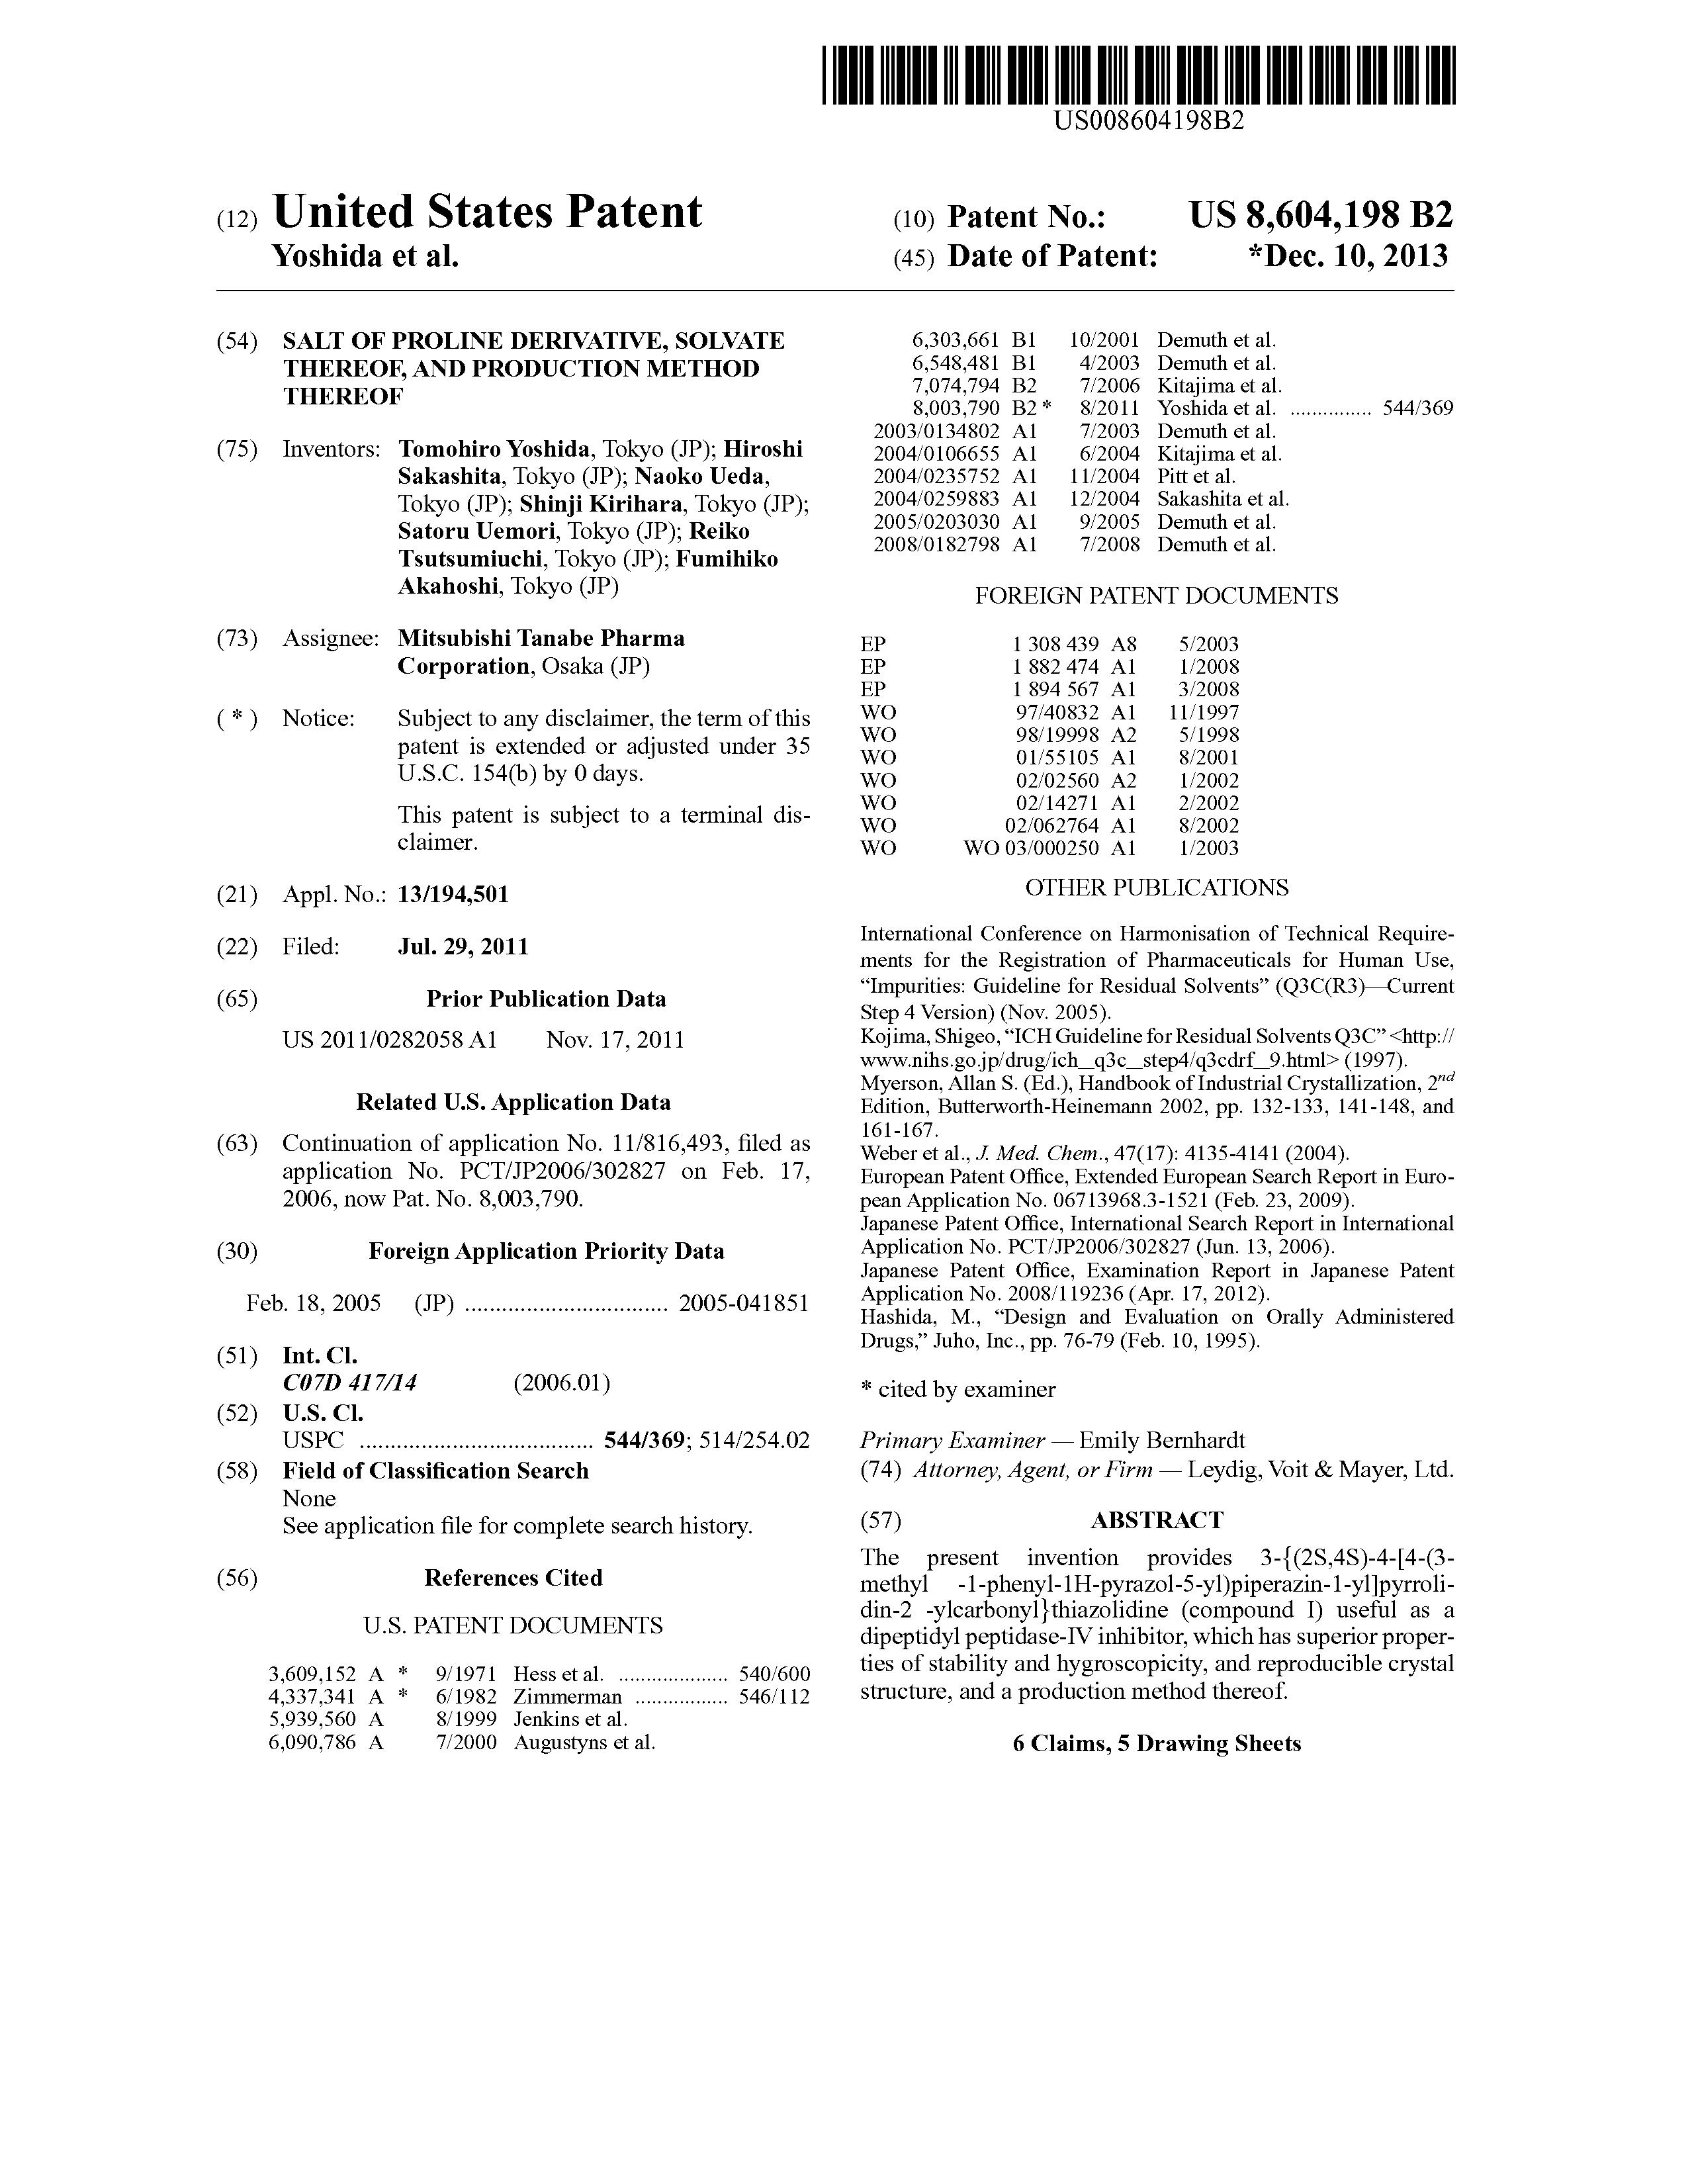 US 8604198 B2 - Salt Of Proline Derivative, Solvate Thereof